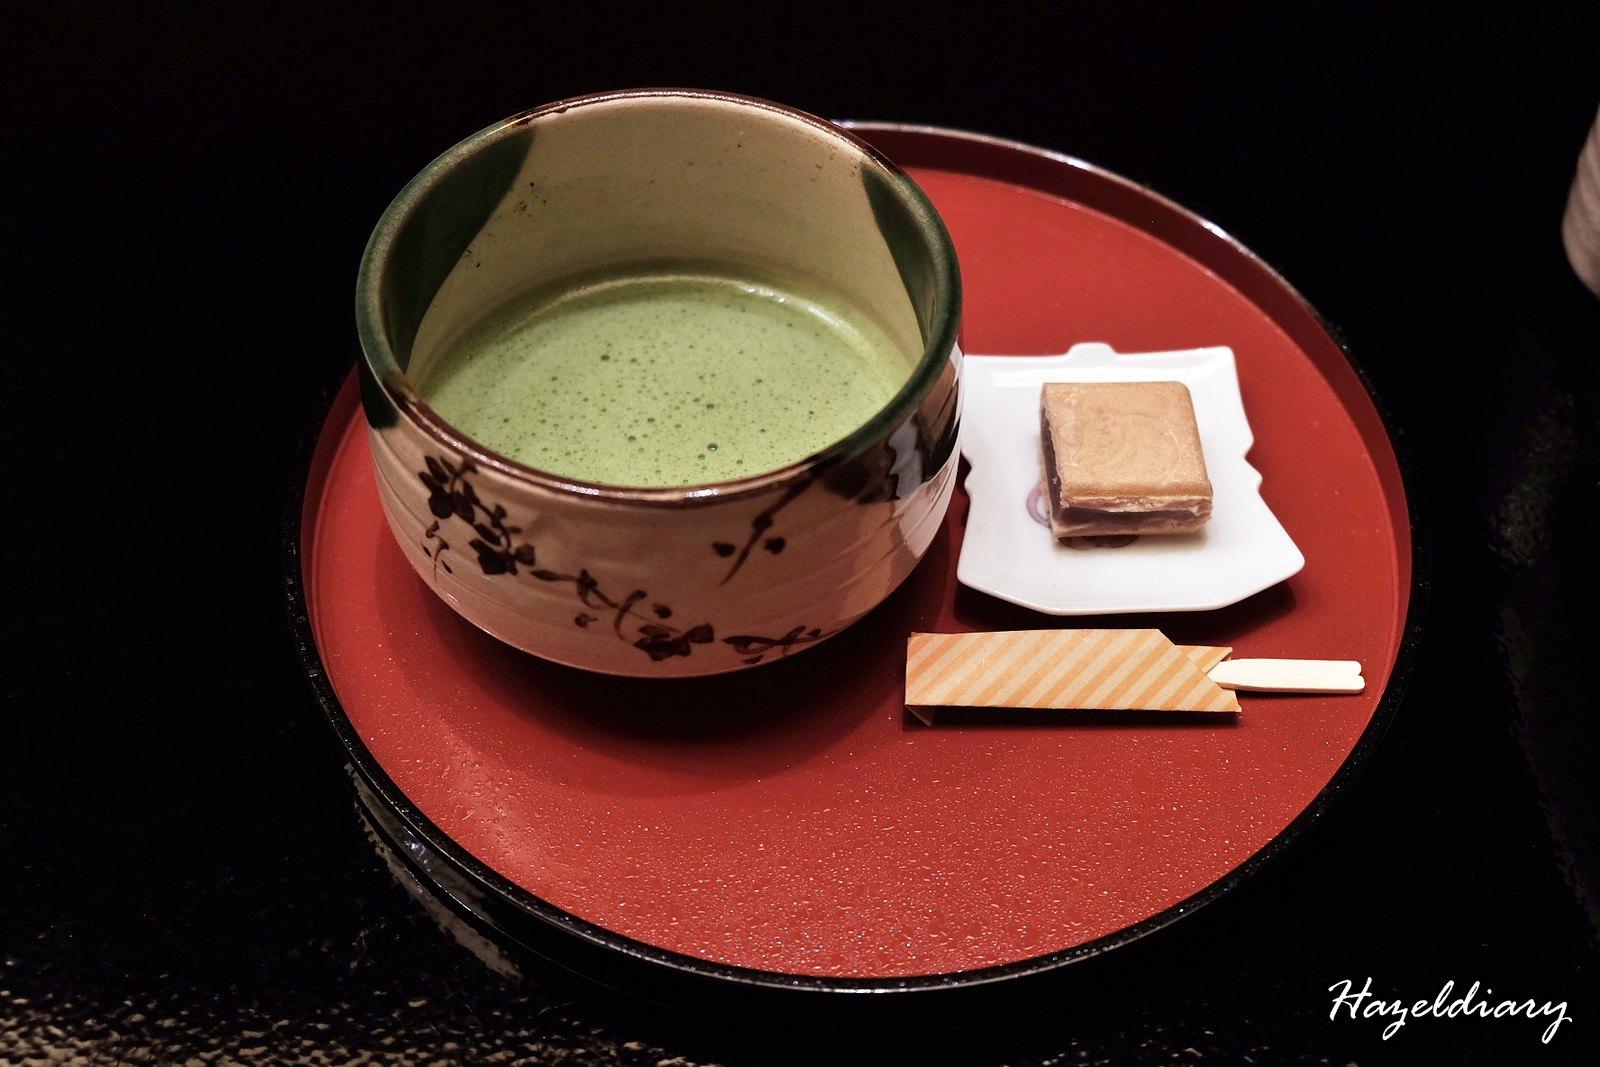 kaiseki soujuan keio plaza hotel tokyo- green tea